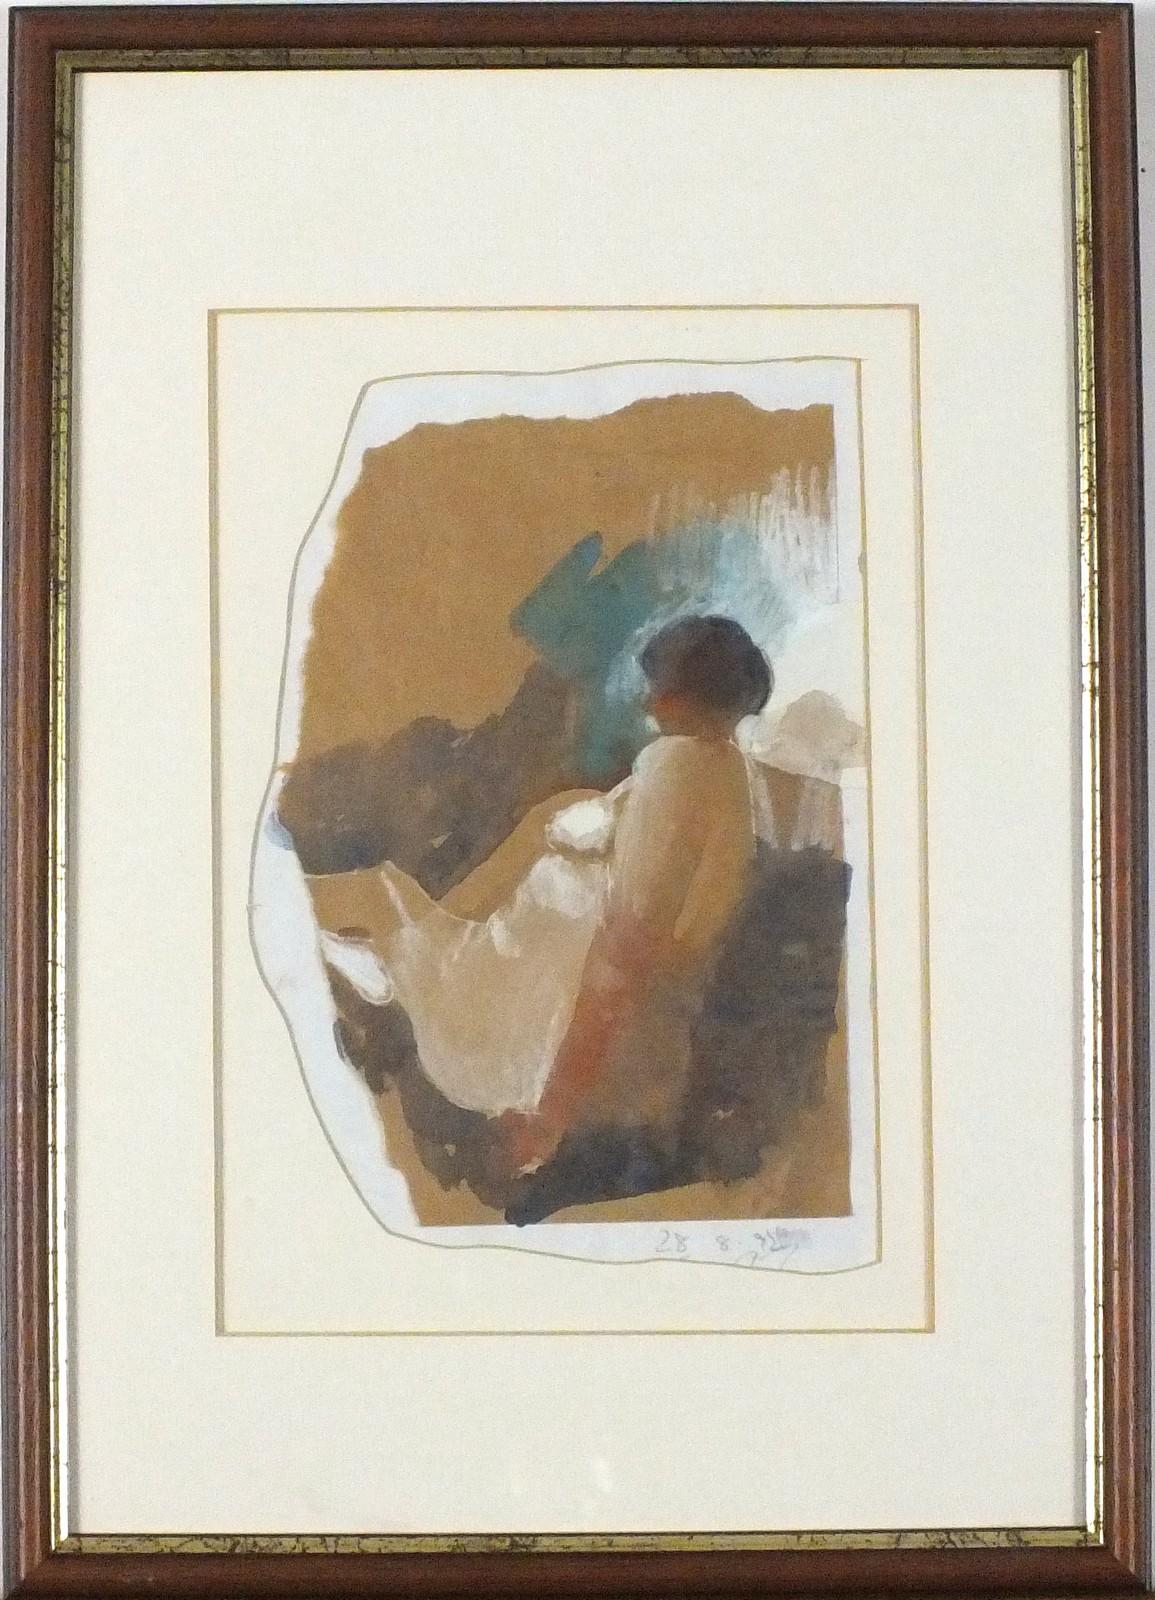 Lot 59 - * Kurt JACKSON (b.1961), Watercolour study on irregular shaped paper, Study of a seated female in